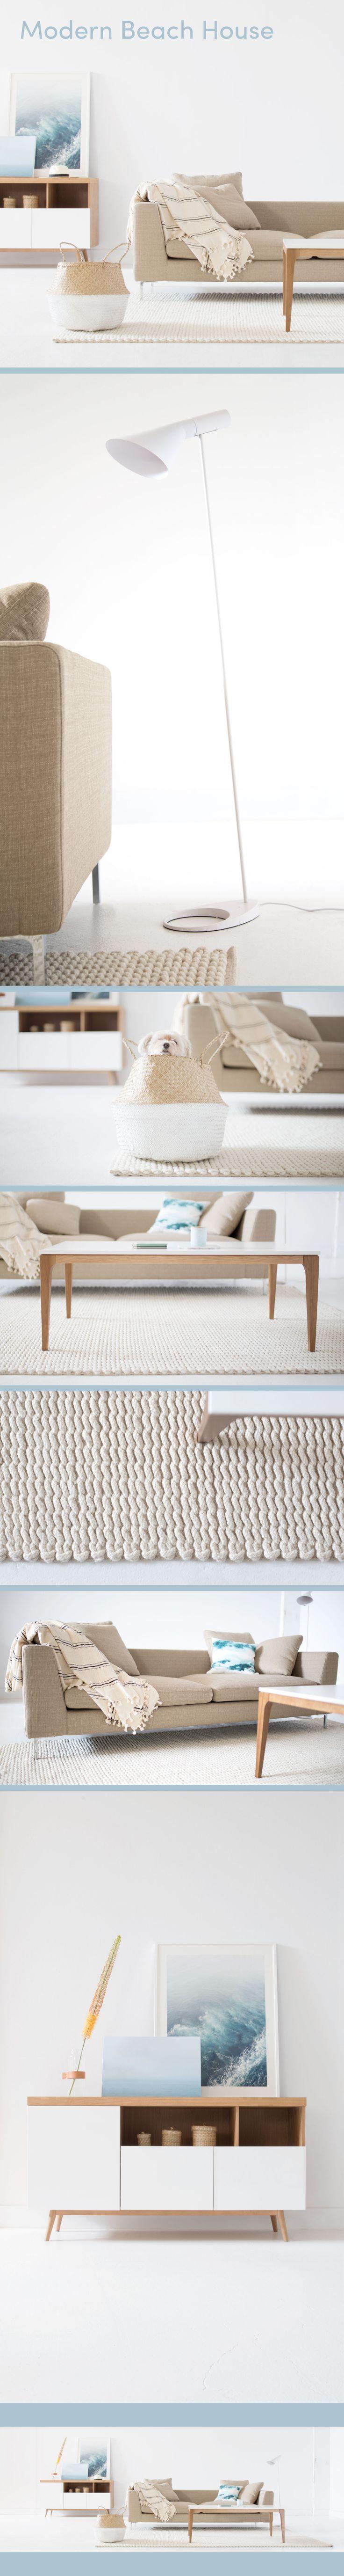 Home Decor Ideas ficial Channel s Pinterest Acount Slide Home Video home design